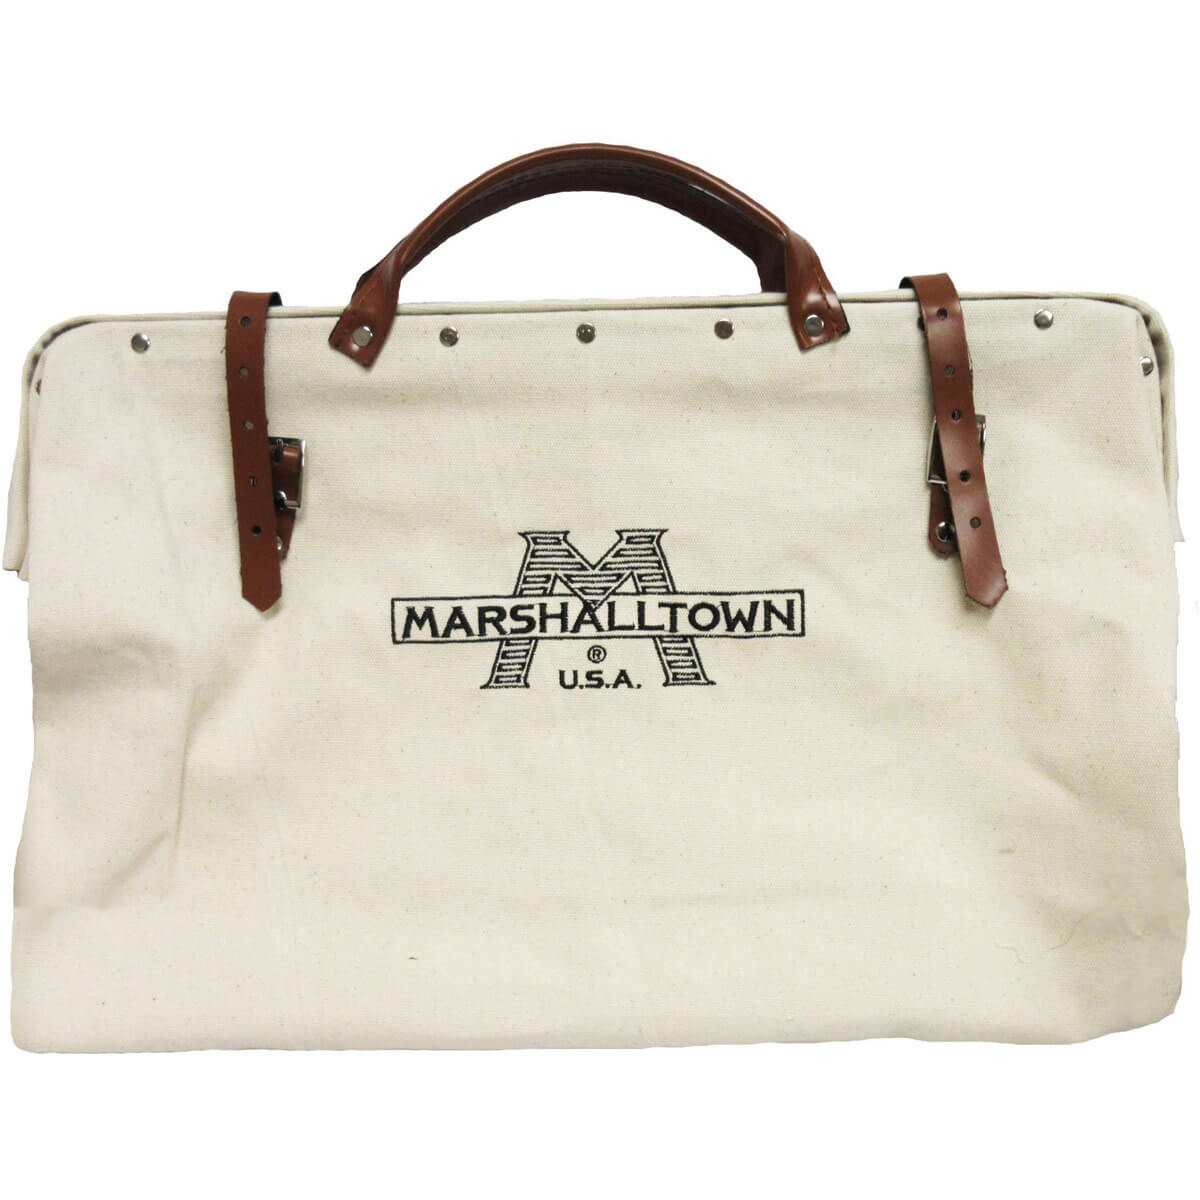 Marshalltown canvas tool bag 831